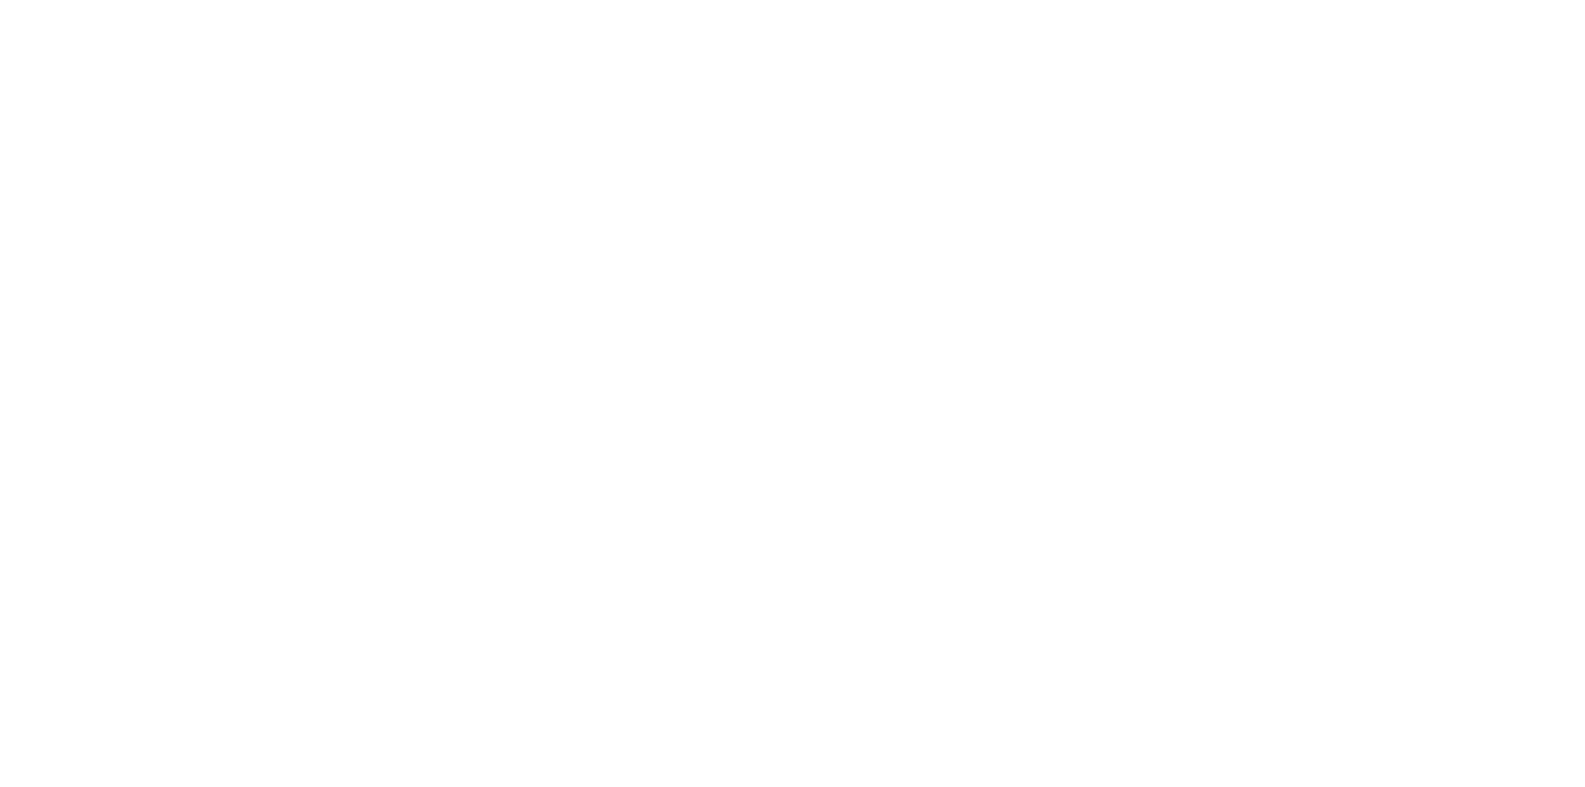 Bolton Gardens new logo